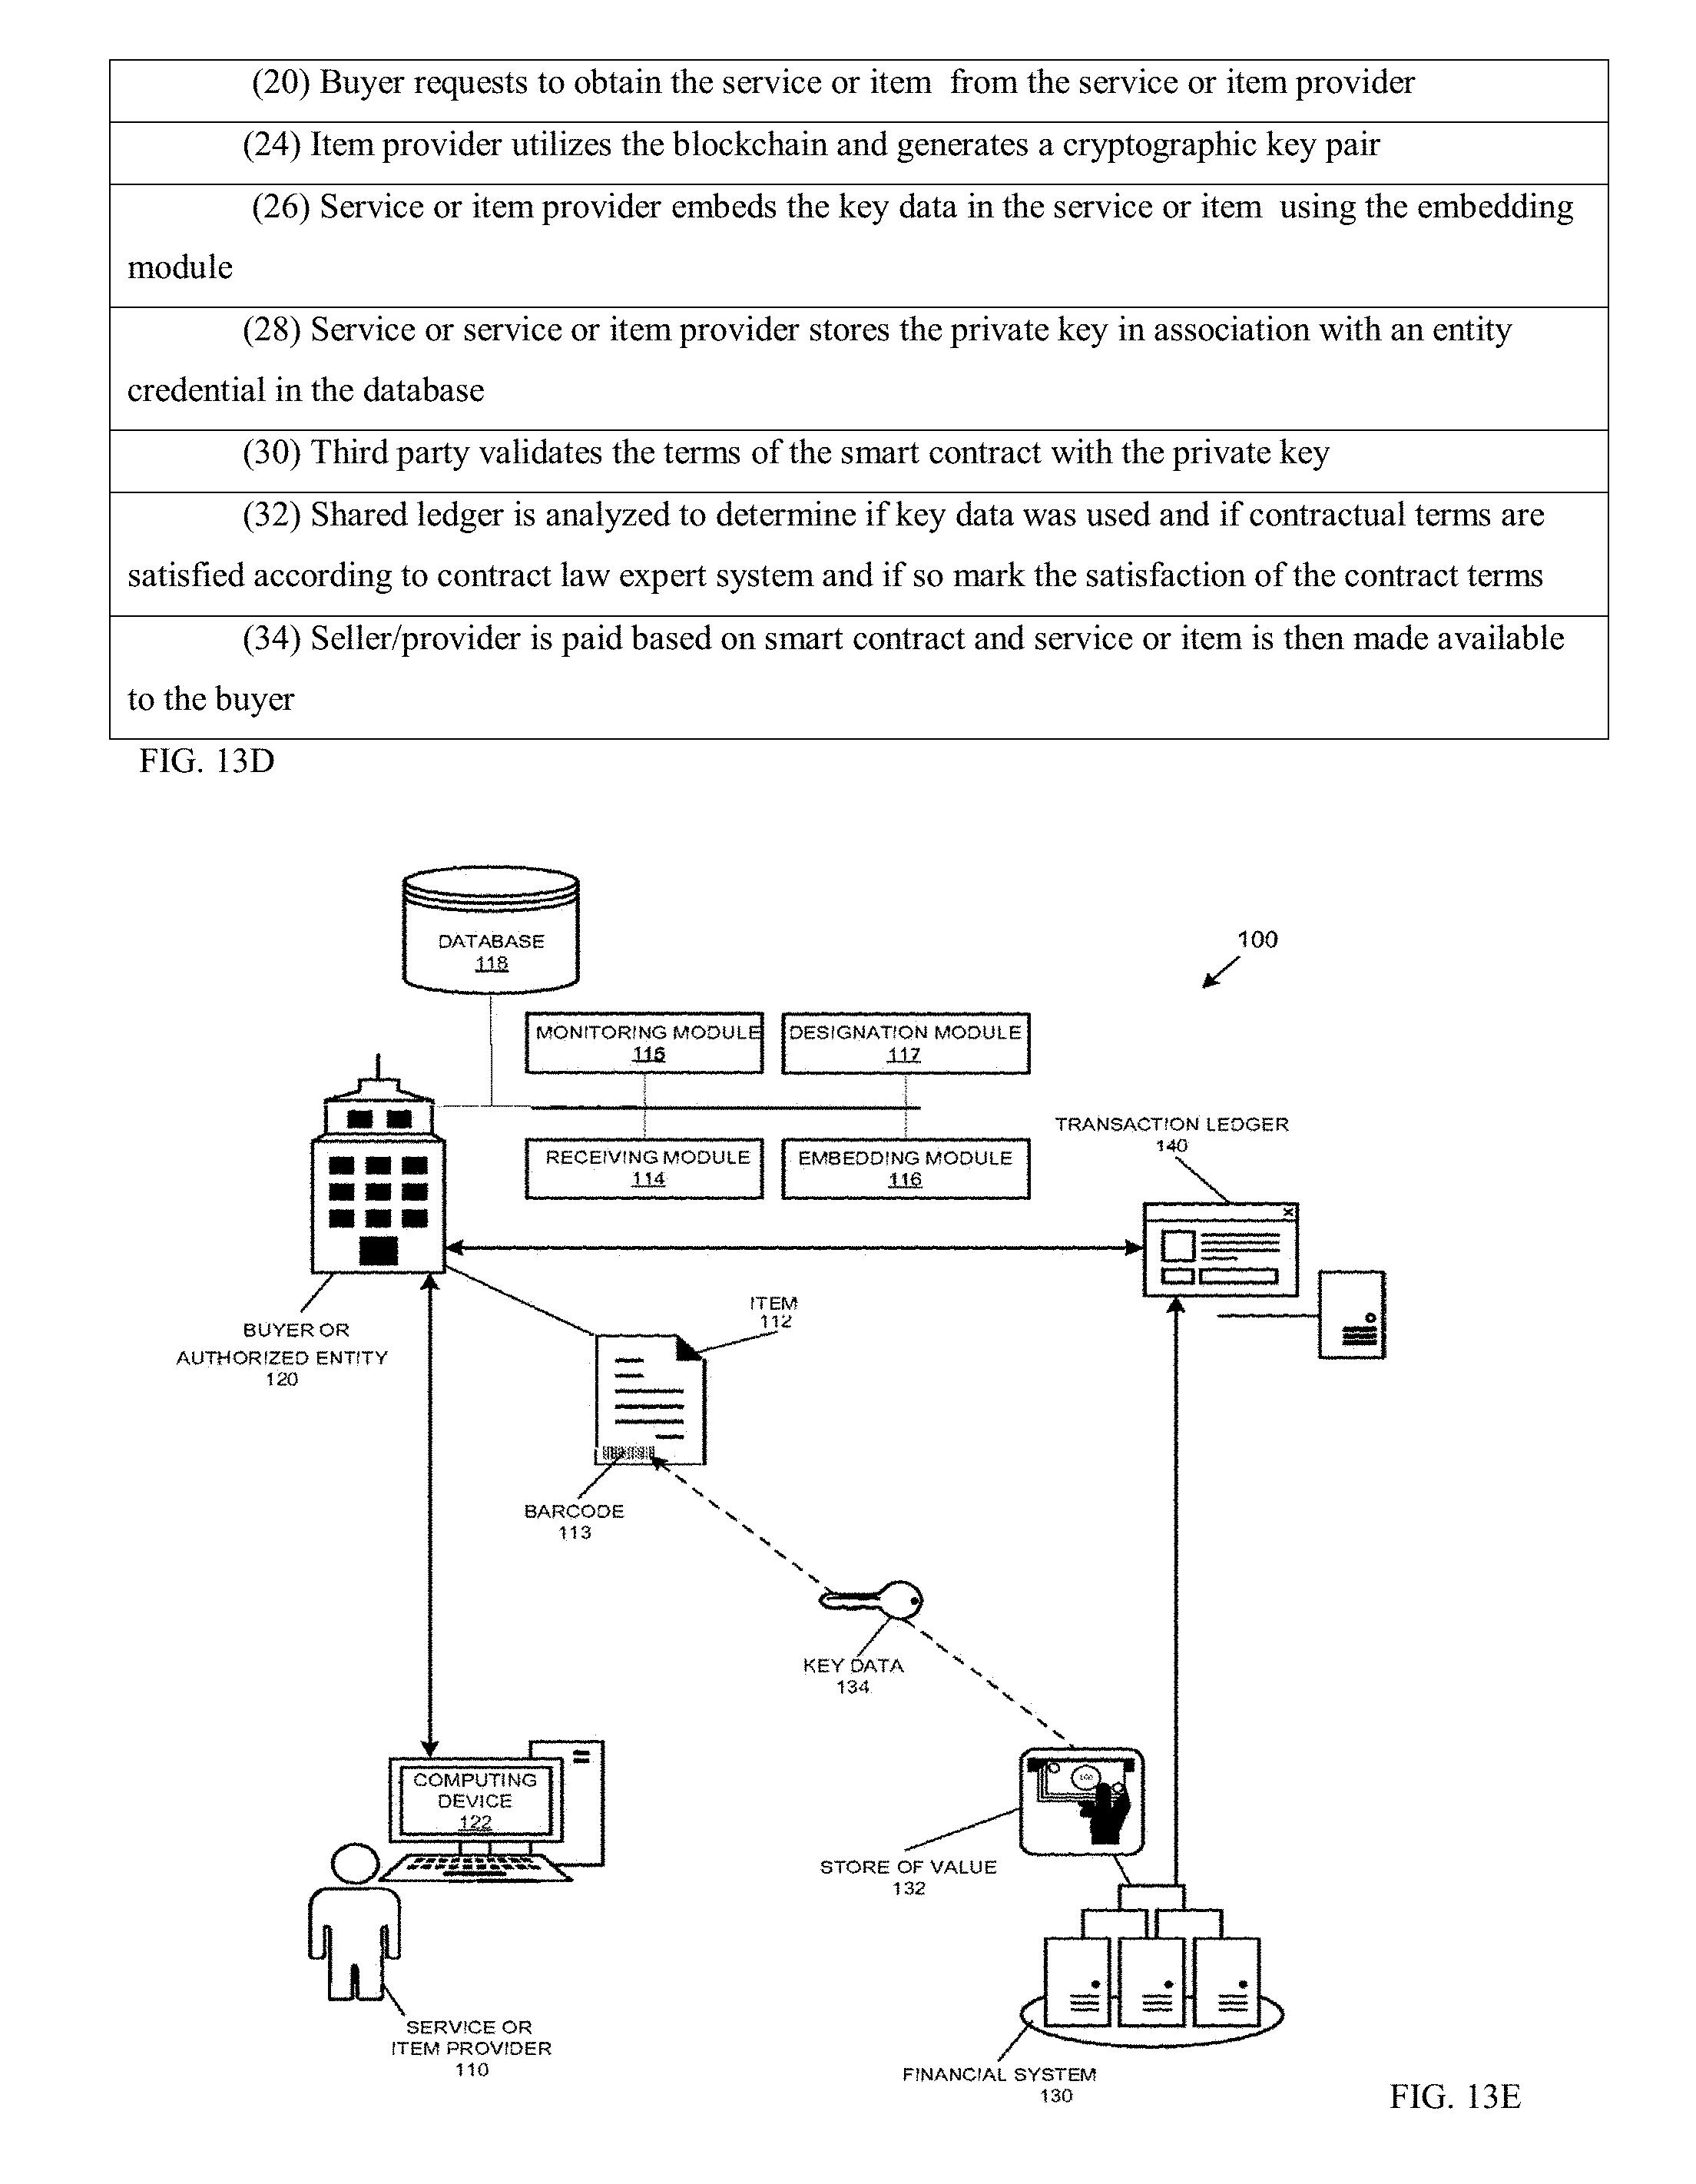 Patent US 10,046,228 B2